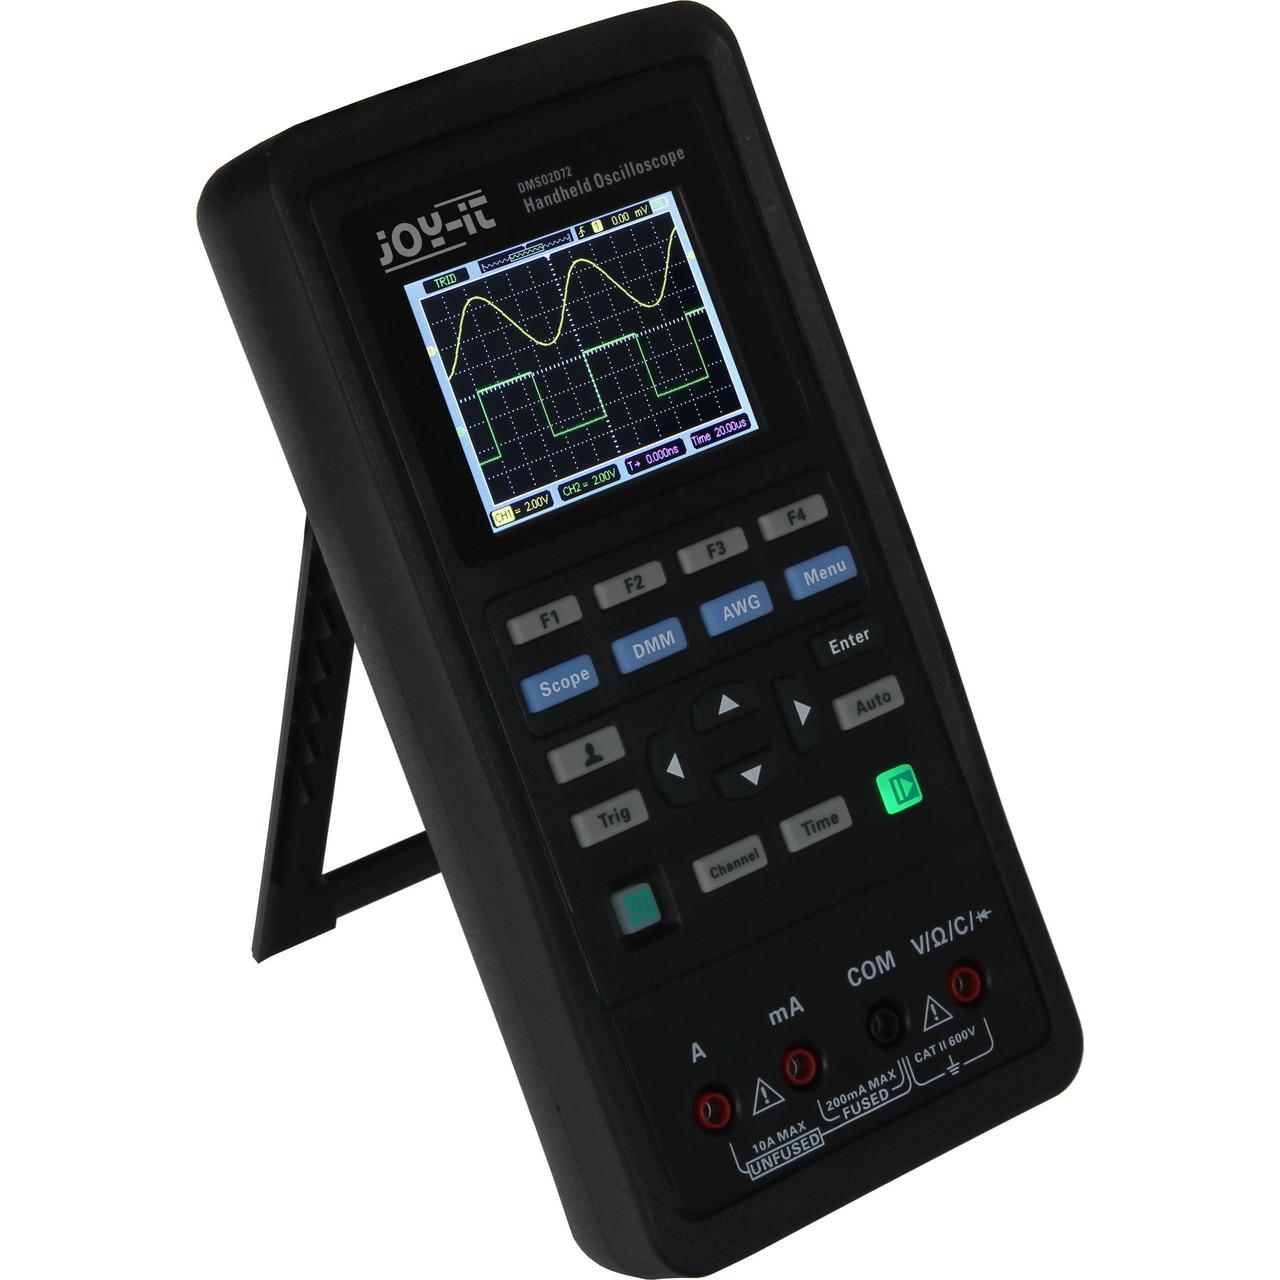 Joy-IT tragbares 3-in-1-Gerät JT-DMSO2D72 aus Oszilloskop- Signalgenerator und Multimeter